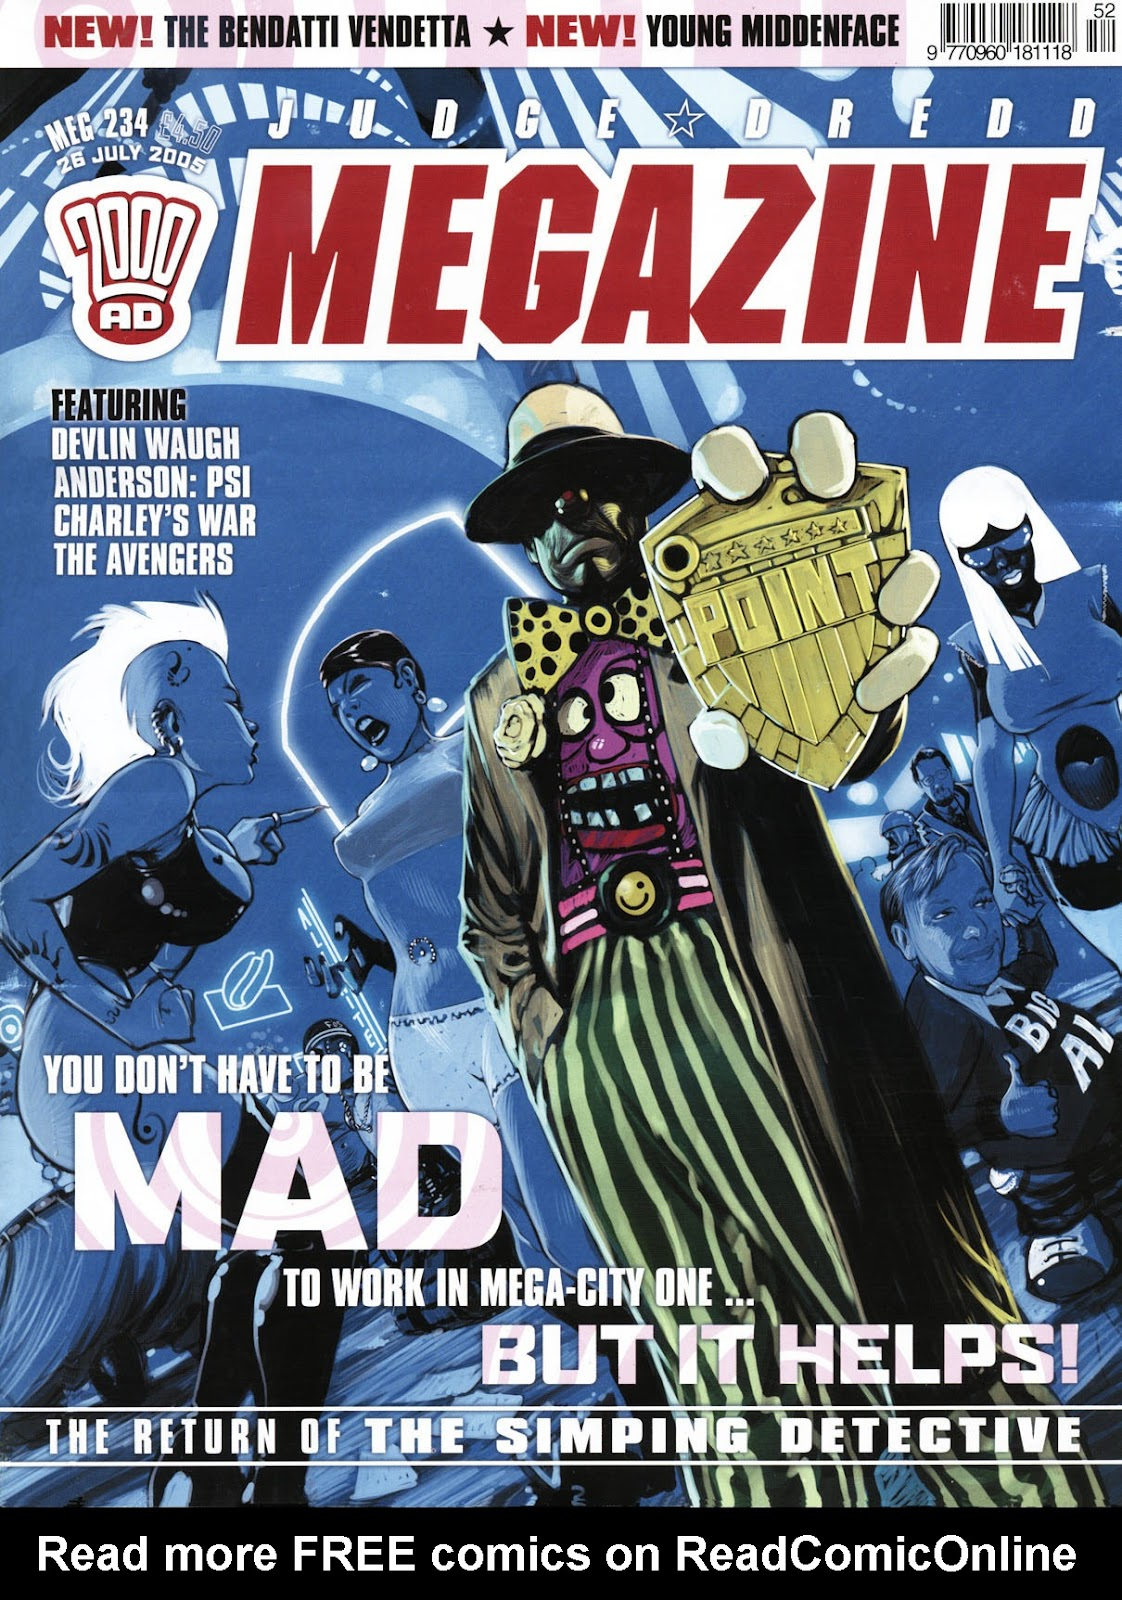 Judge Dredd Megazine (Vol. 5) issue 234 - Page 1